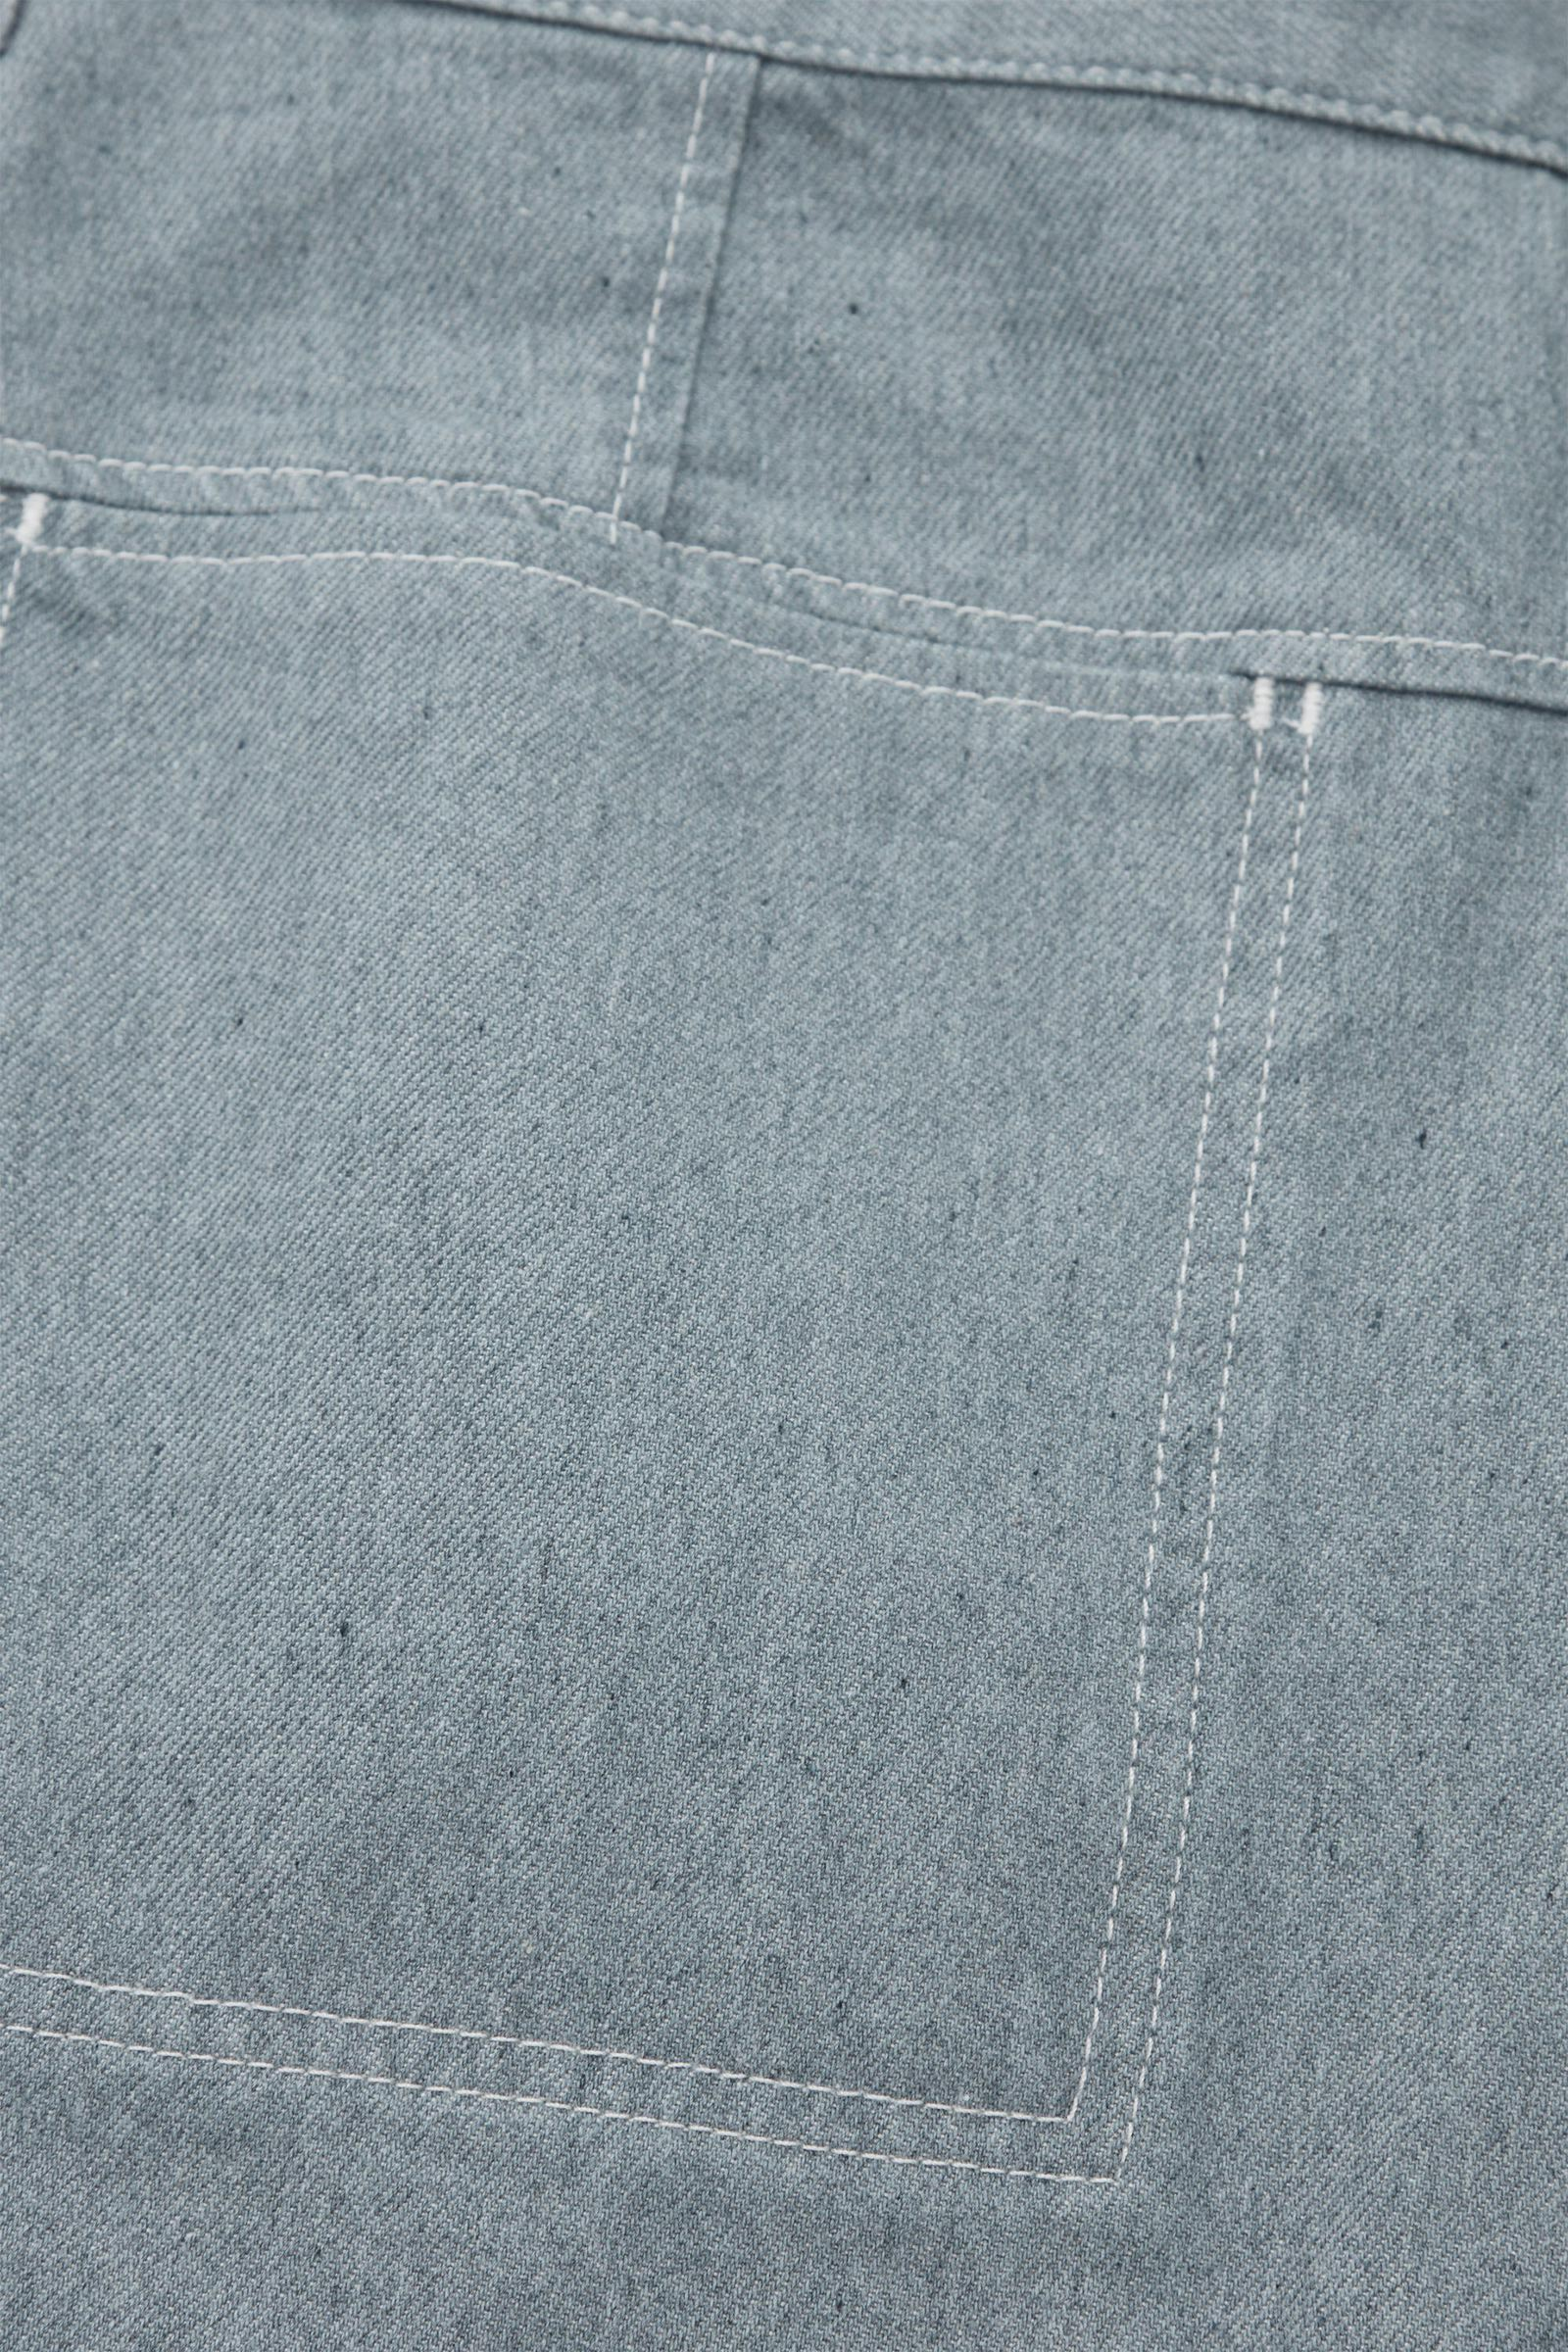 COS 리사이클드 코튼 데님 카고 트라우저의 라이트 블루컬러 Detail입니다.